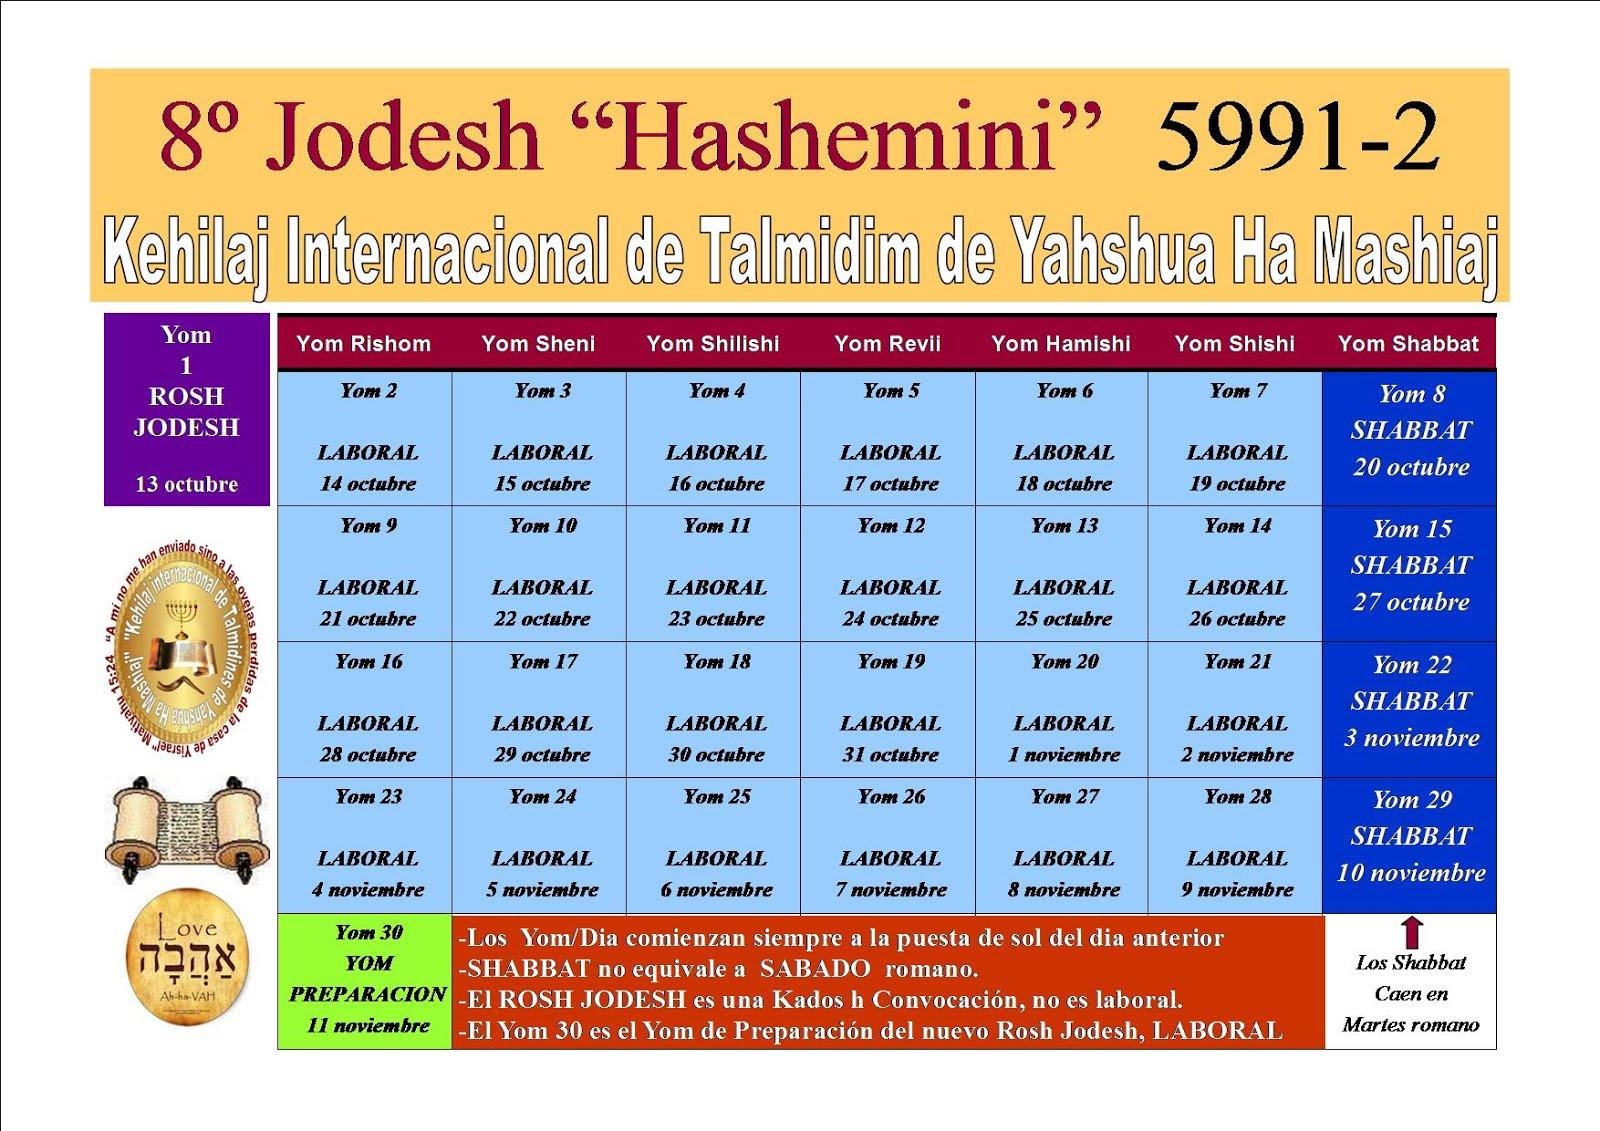 CALENDARIO DEL 8º JODESH